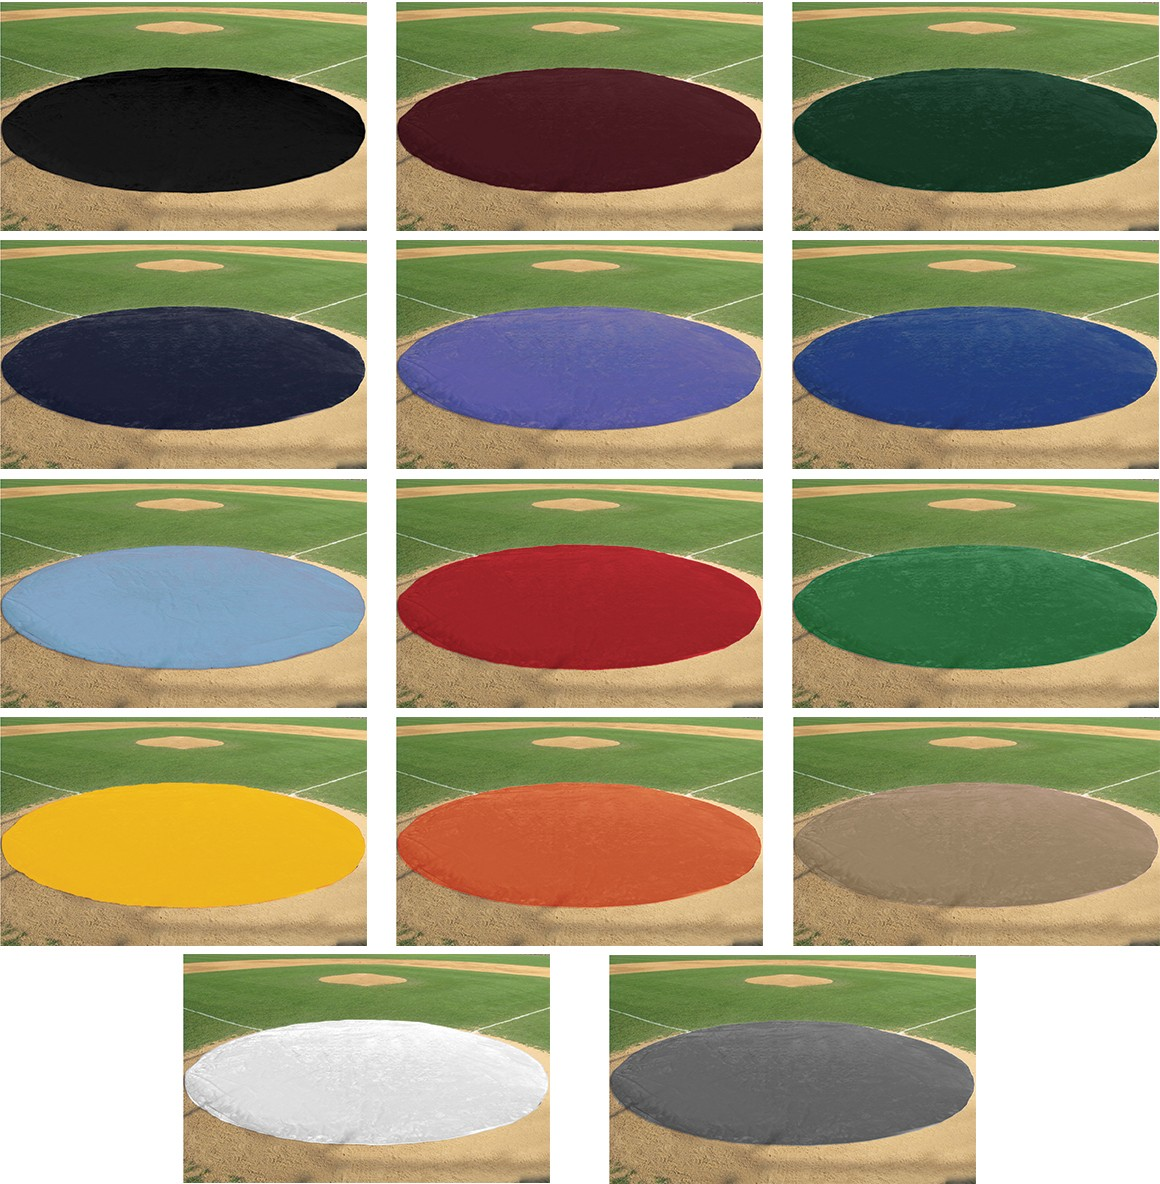 Fieldsaver 30 Diameter Home Plate Cover Vinyl A15 734